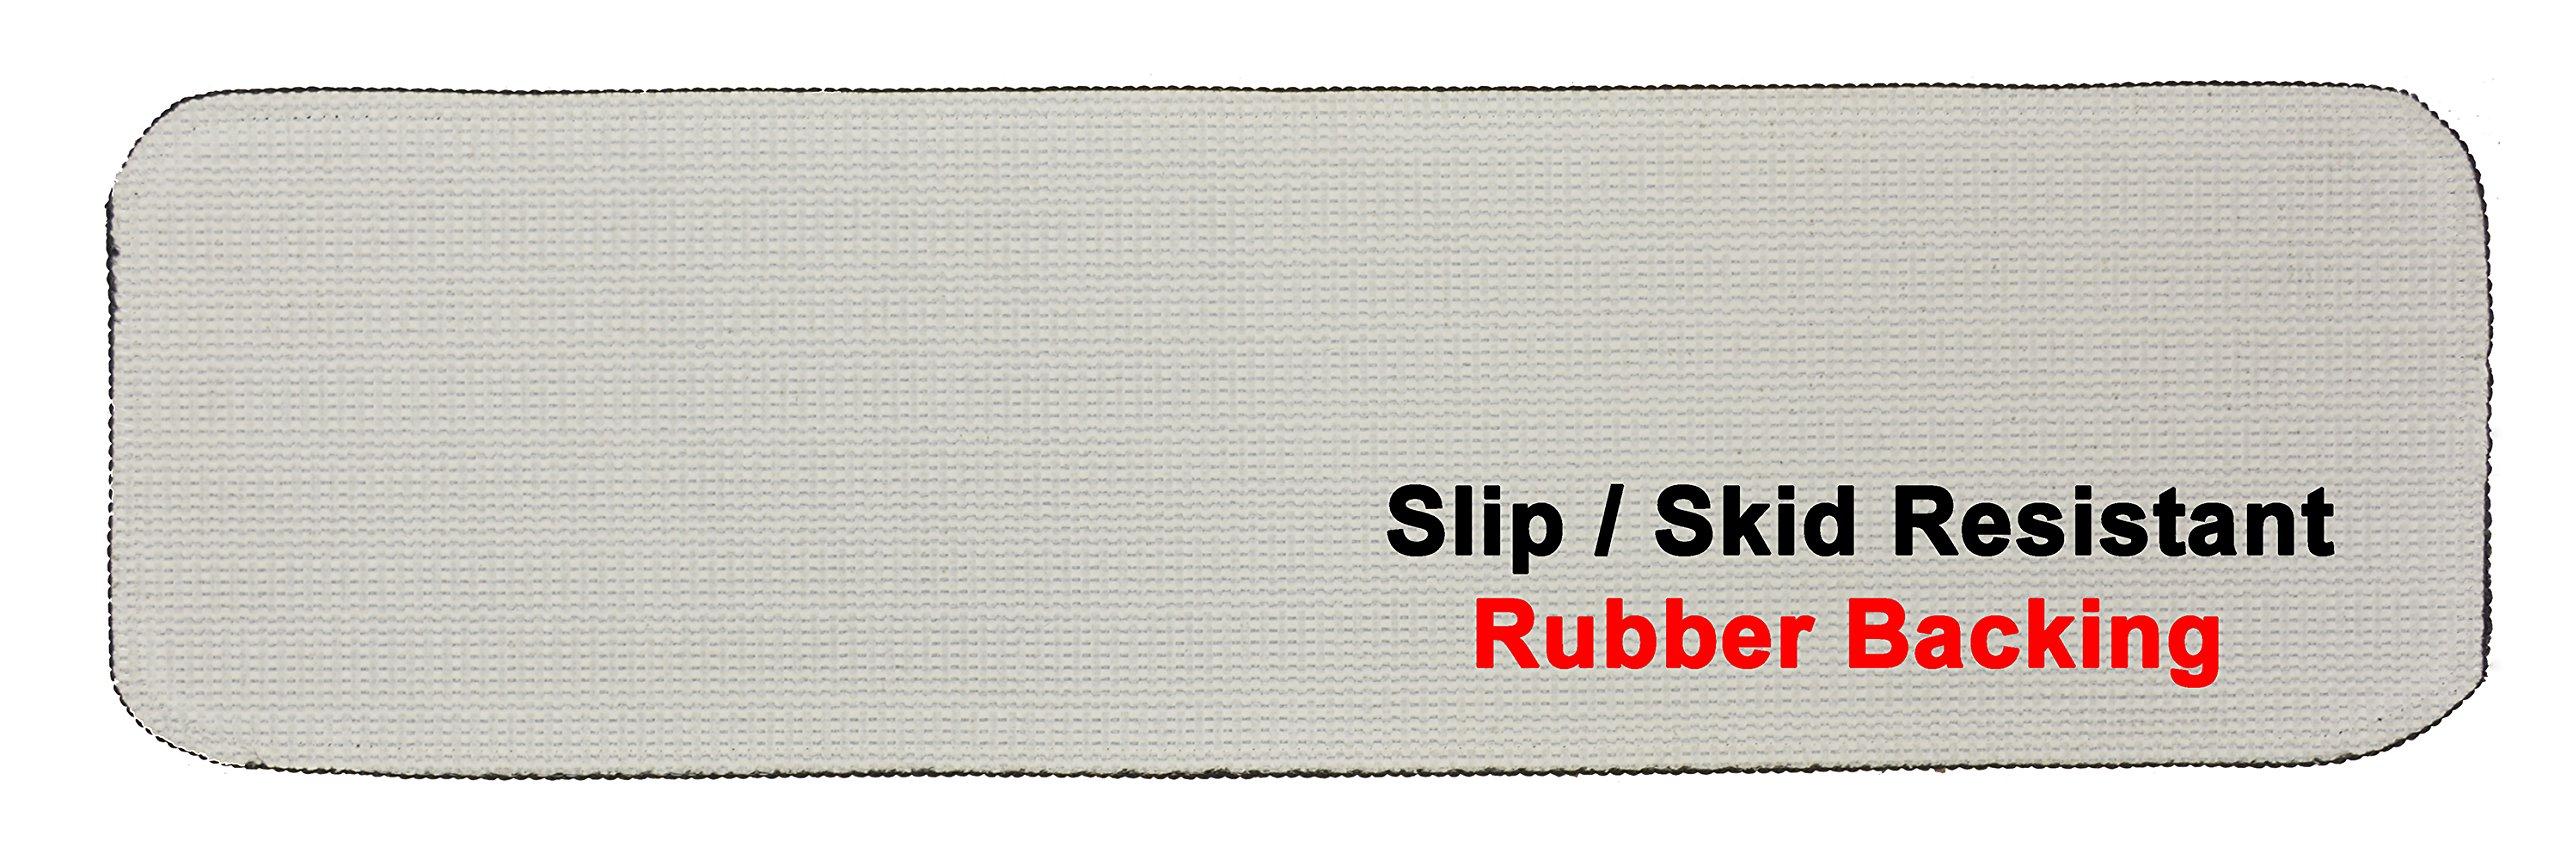 RugStylesOnline TRENDY-ST-8X30-NAVY-13 Trendy Stair Tread Treads Indoor Skid Slip Resistant Carpet Stair Tread Treads Machine Washable 8 ½'' W x 30'' L, Royal Navy Blue, Set of 13 by RugStylesOnline (Image #5)